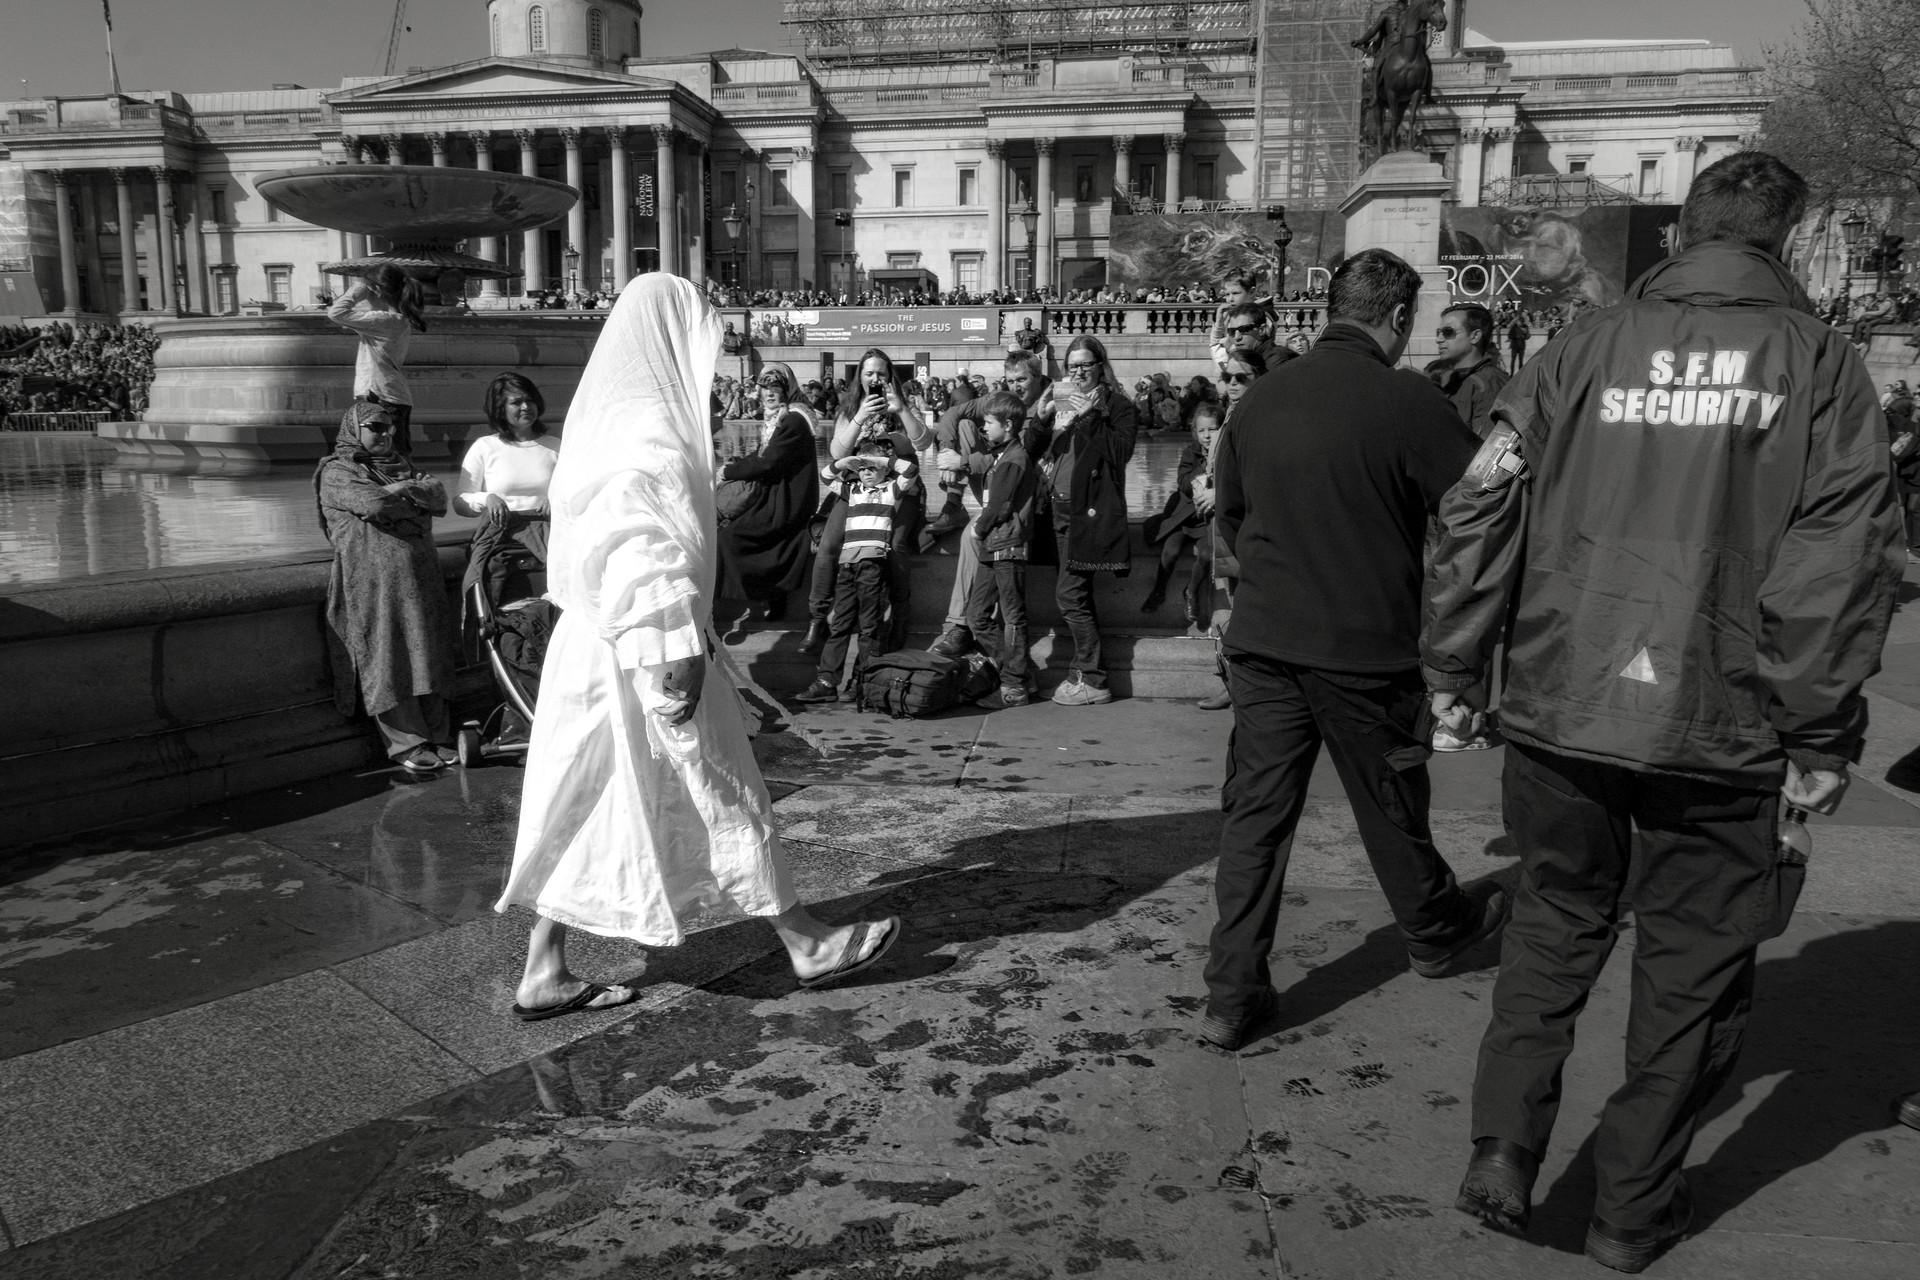 Jesus on Trafalgar Square